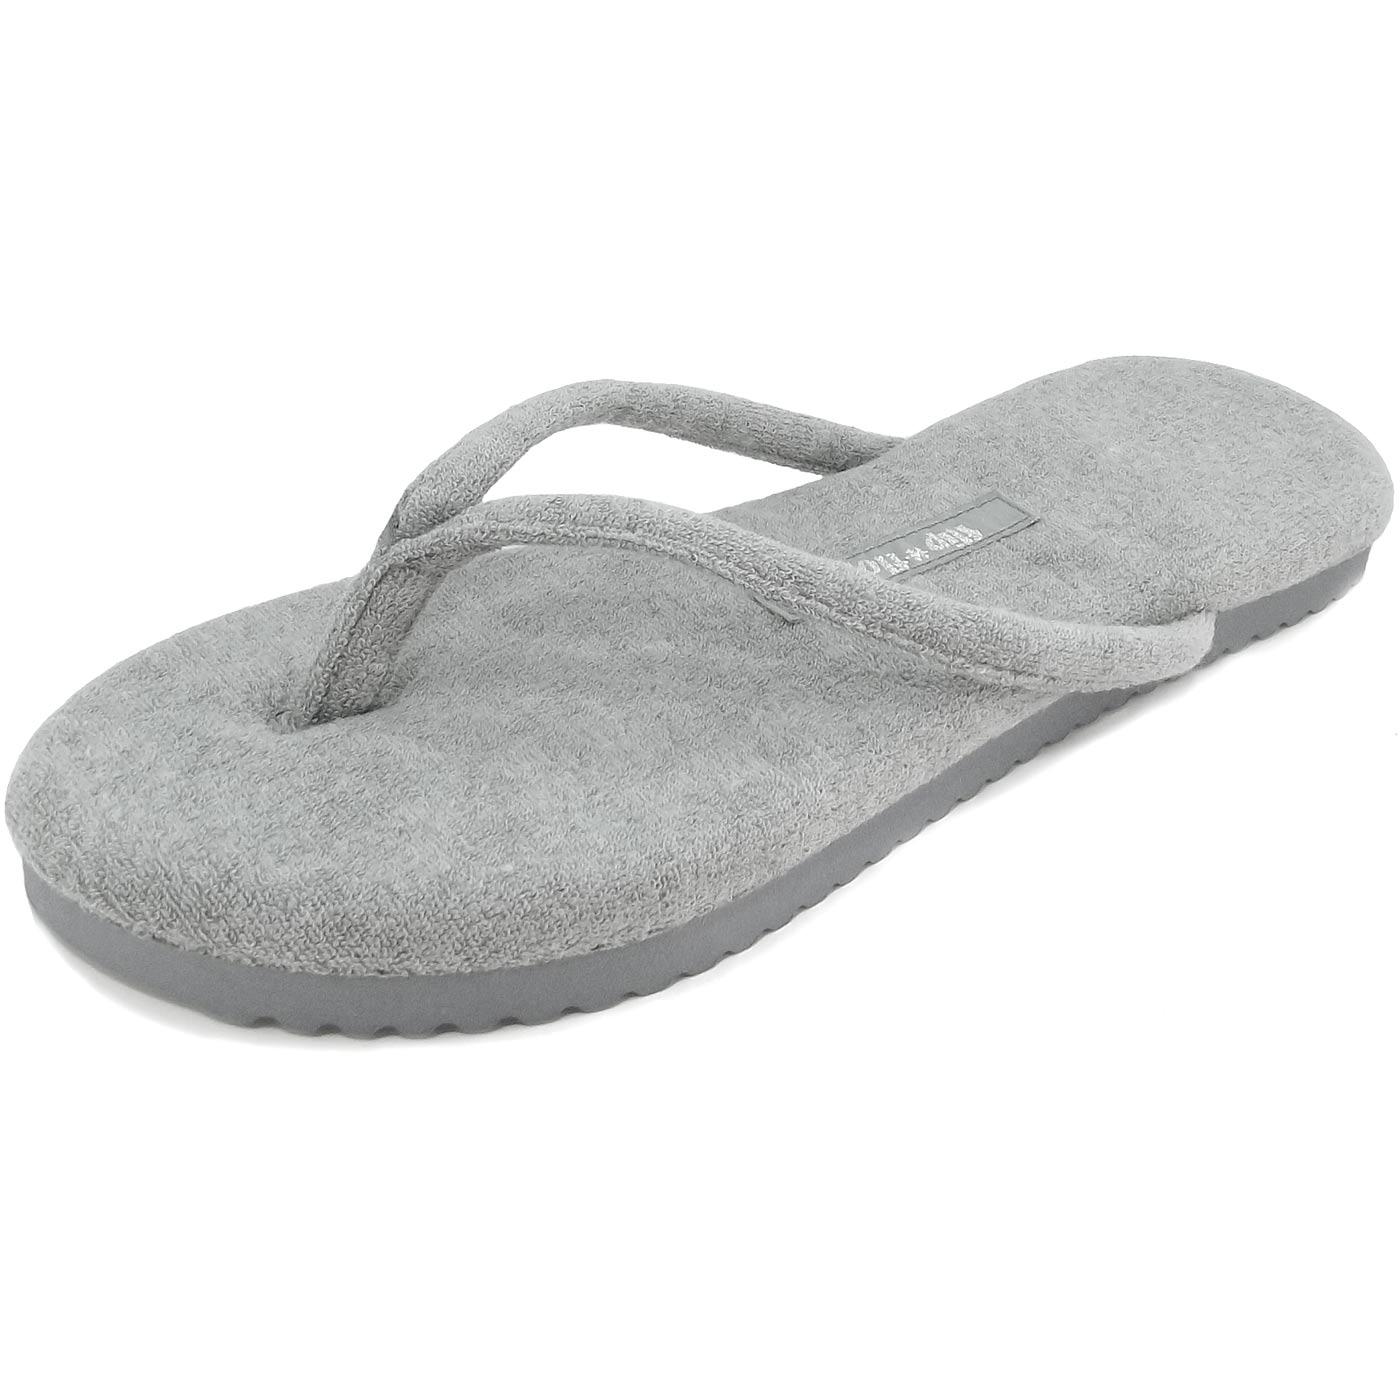 online retailer 282f6 bb030 flip*flop Slim Spa grau (whale) | Flux Online